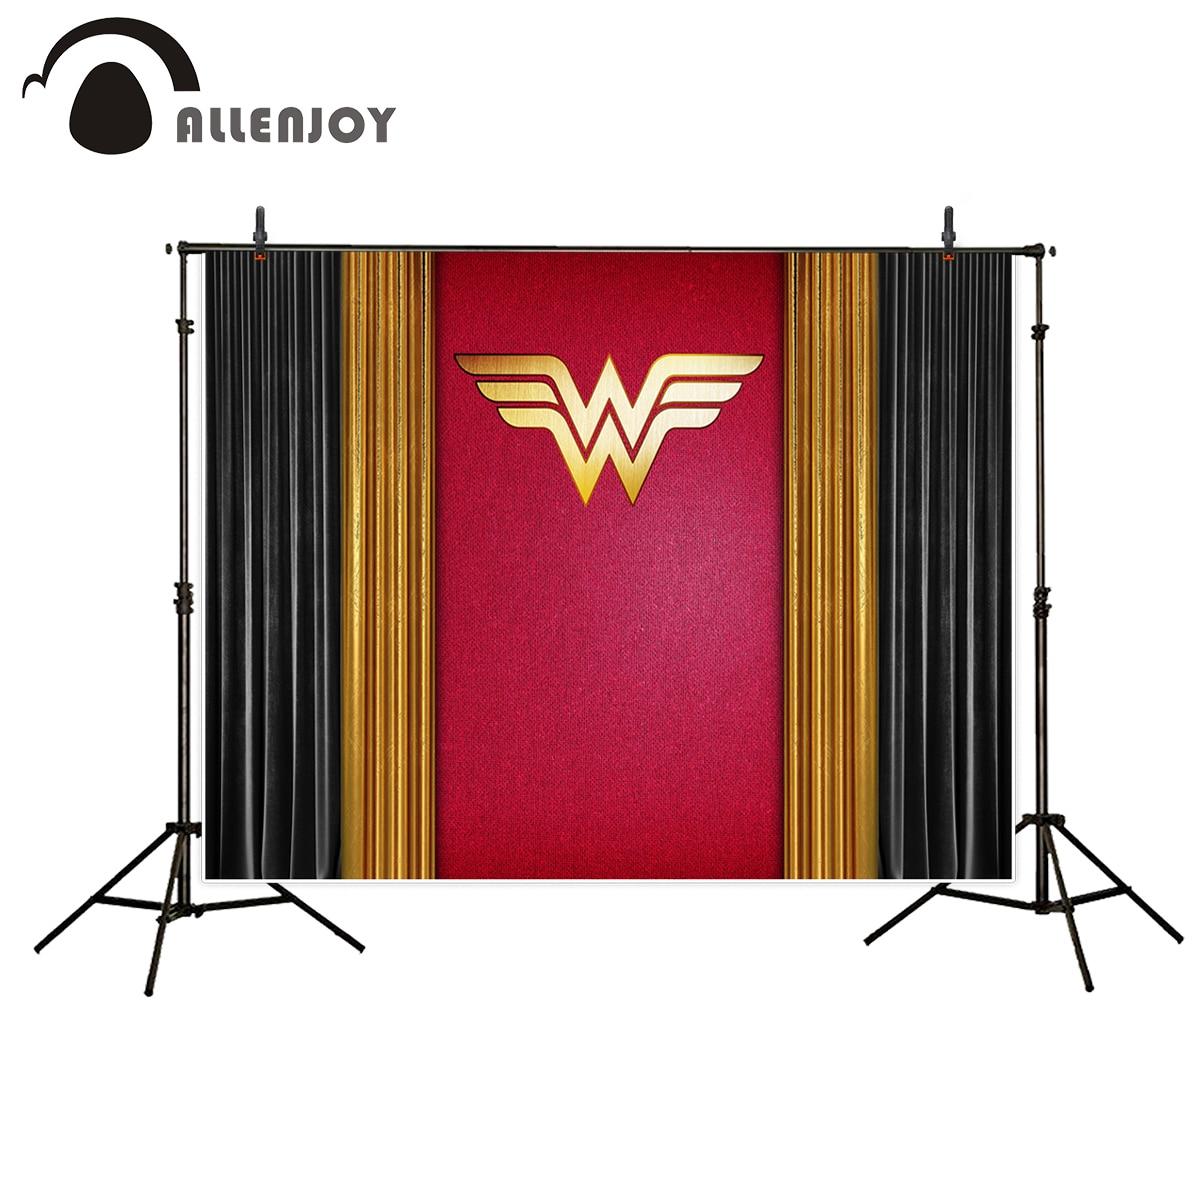 Allenjoy Vinyl photography Black Gold Red LOGO Customized file vinyl photography backdrop customize personal backdrop for studio vinyl wonderland photography backdrop